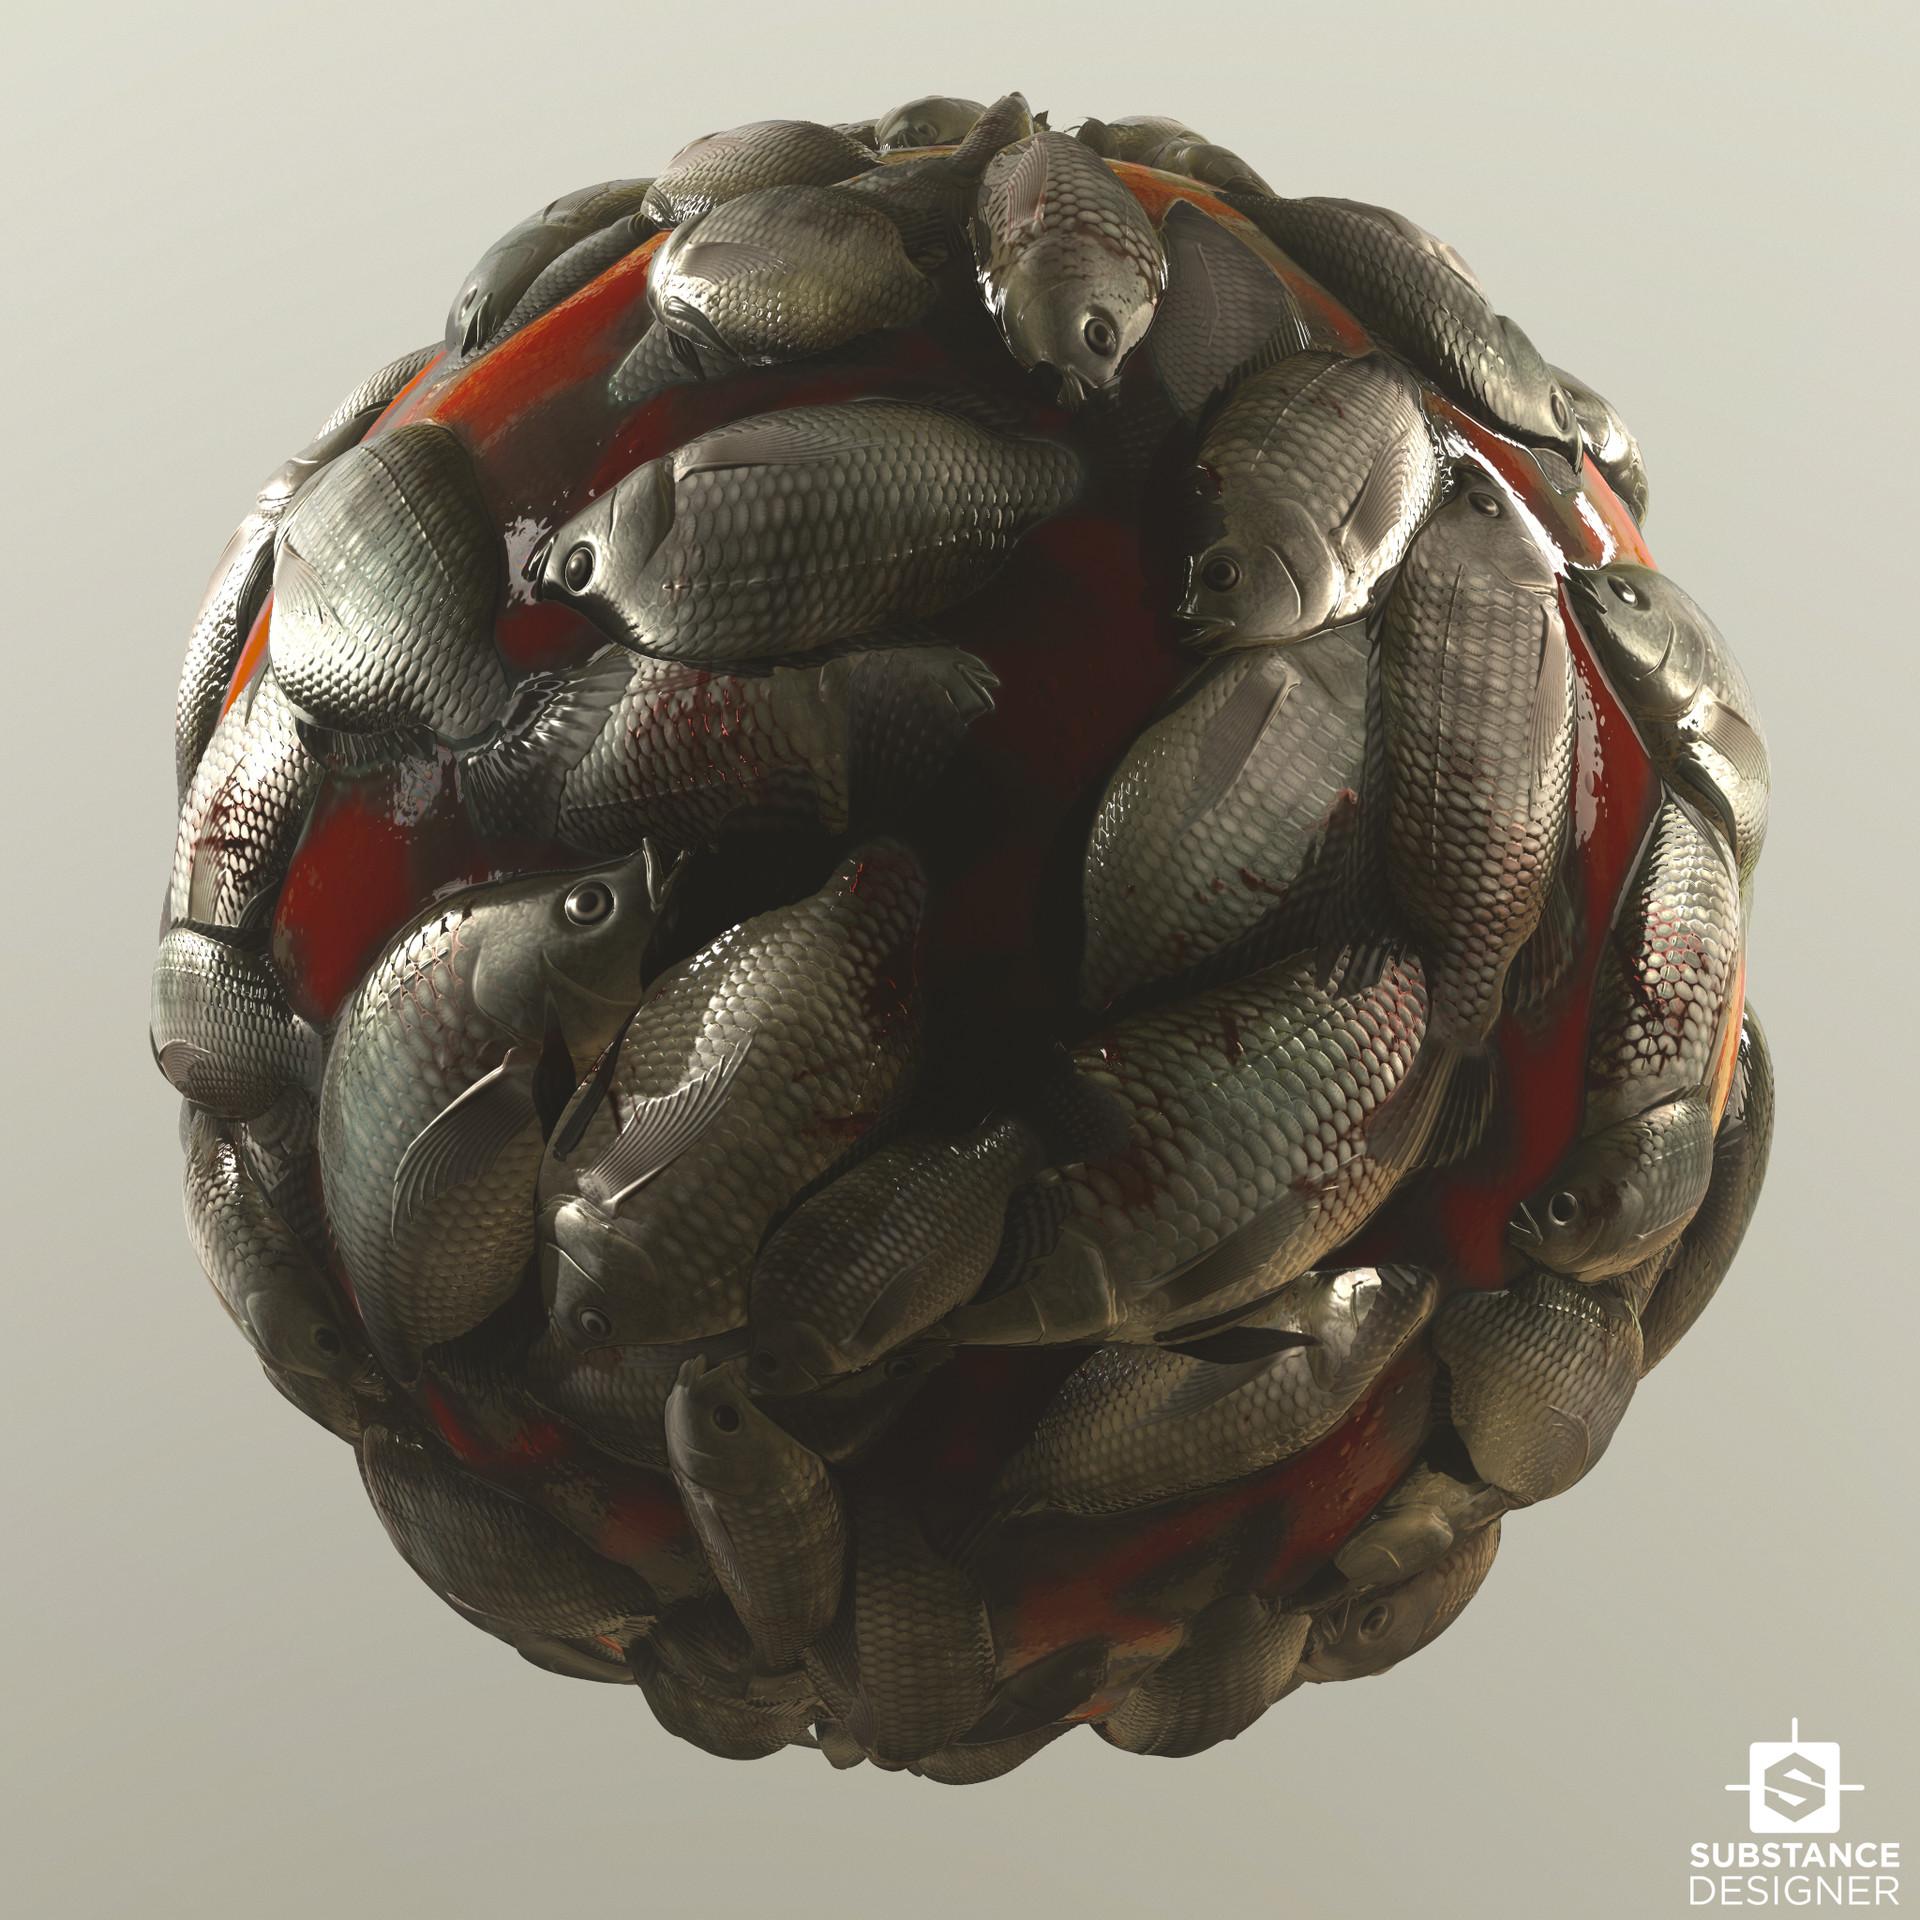 Dead Fish Pile: Building Complex Shapes in Designer